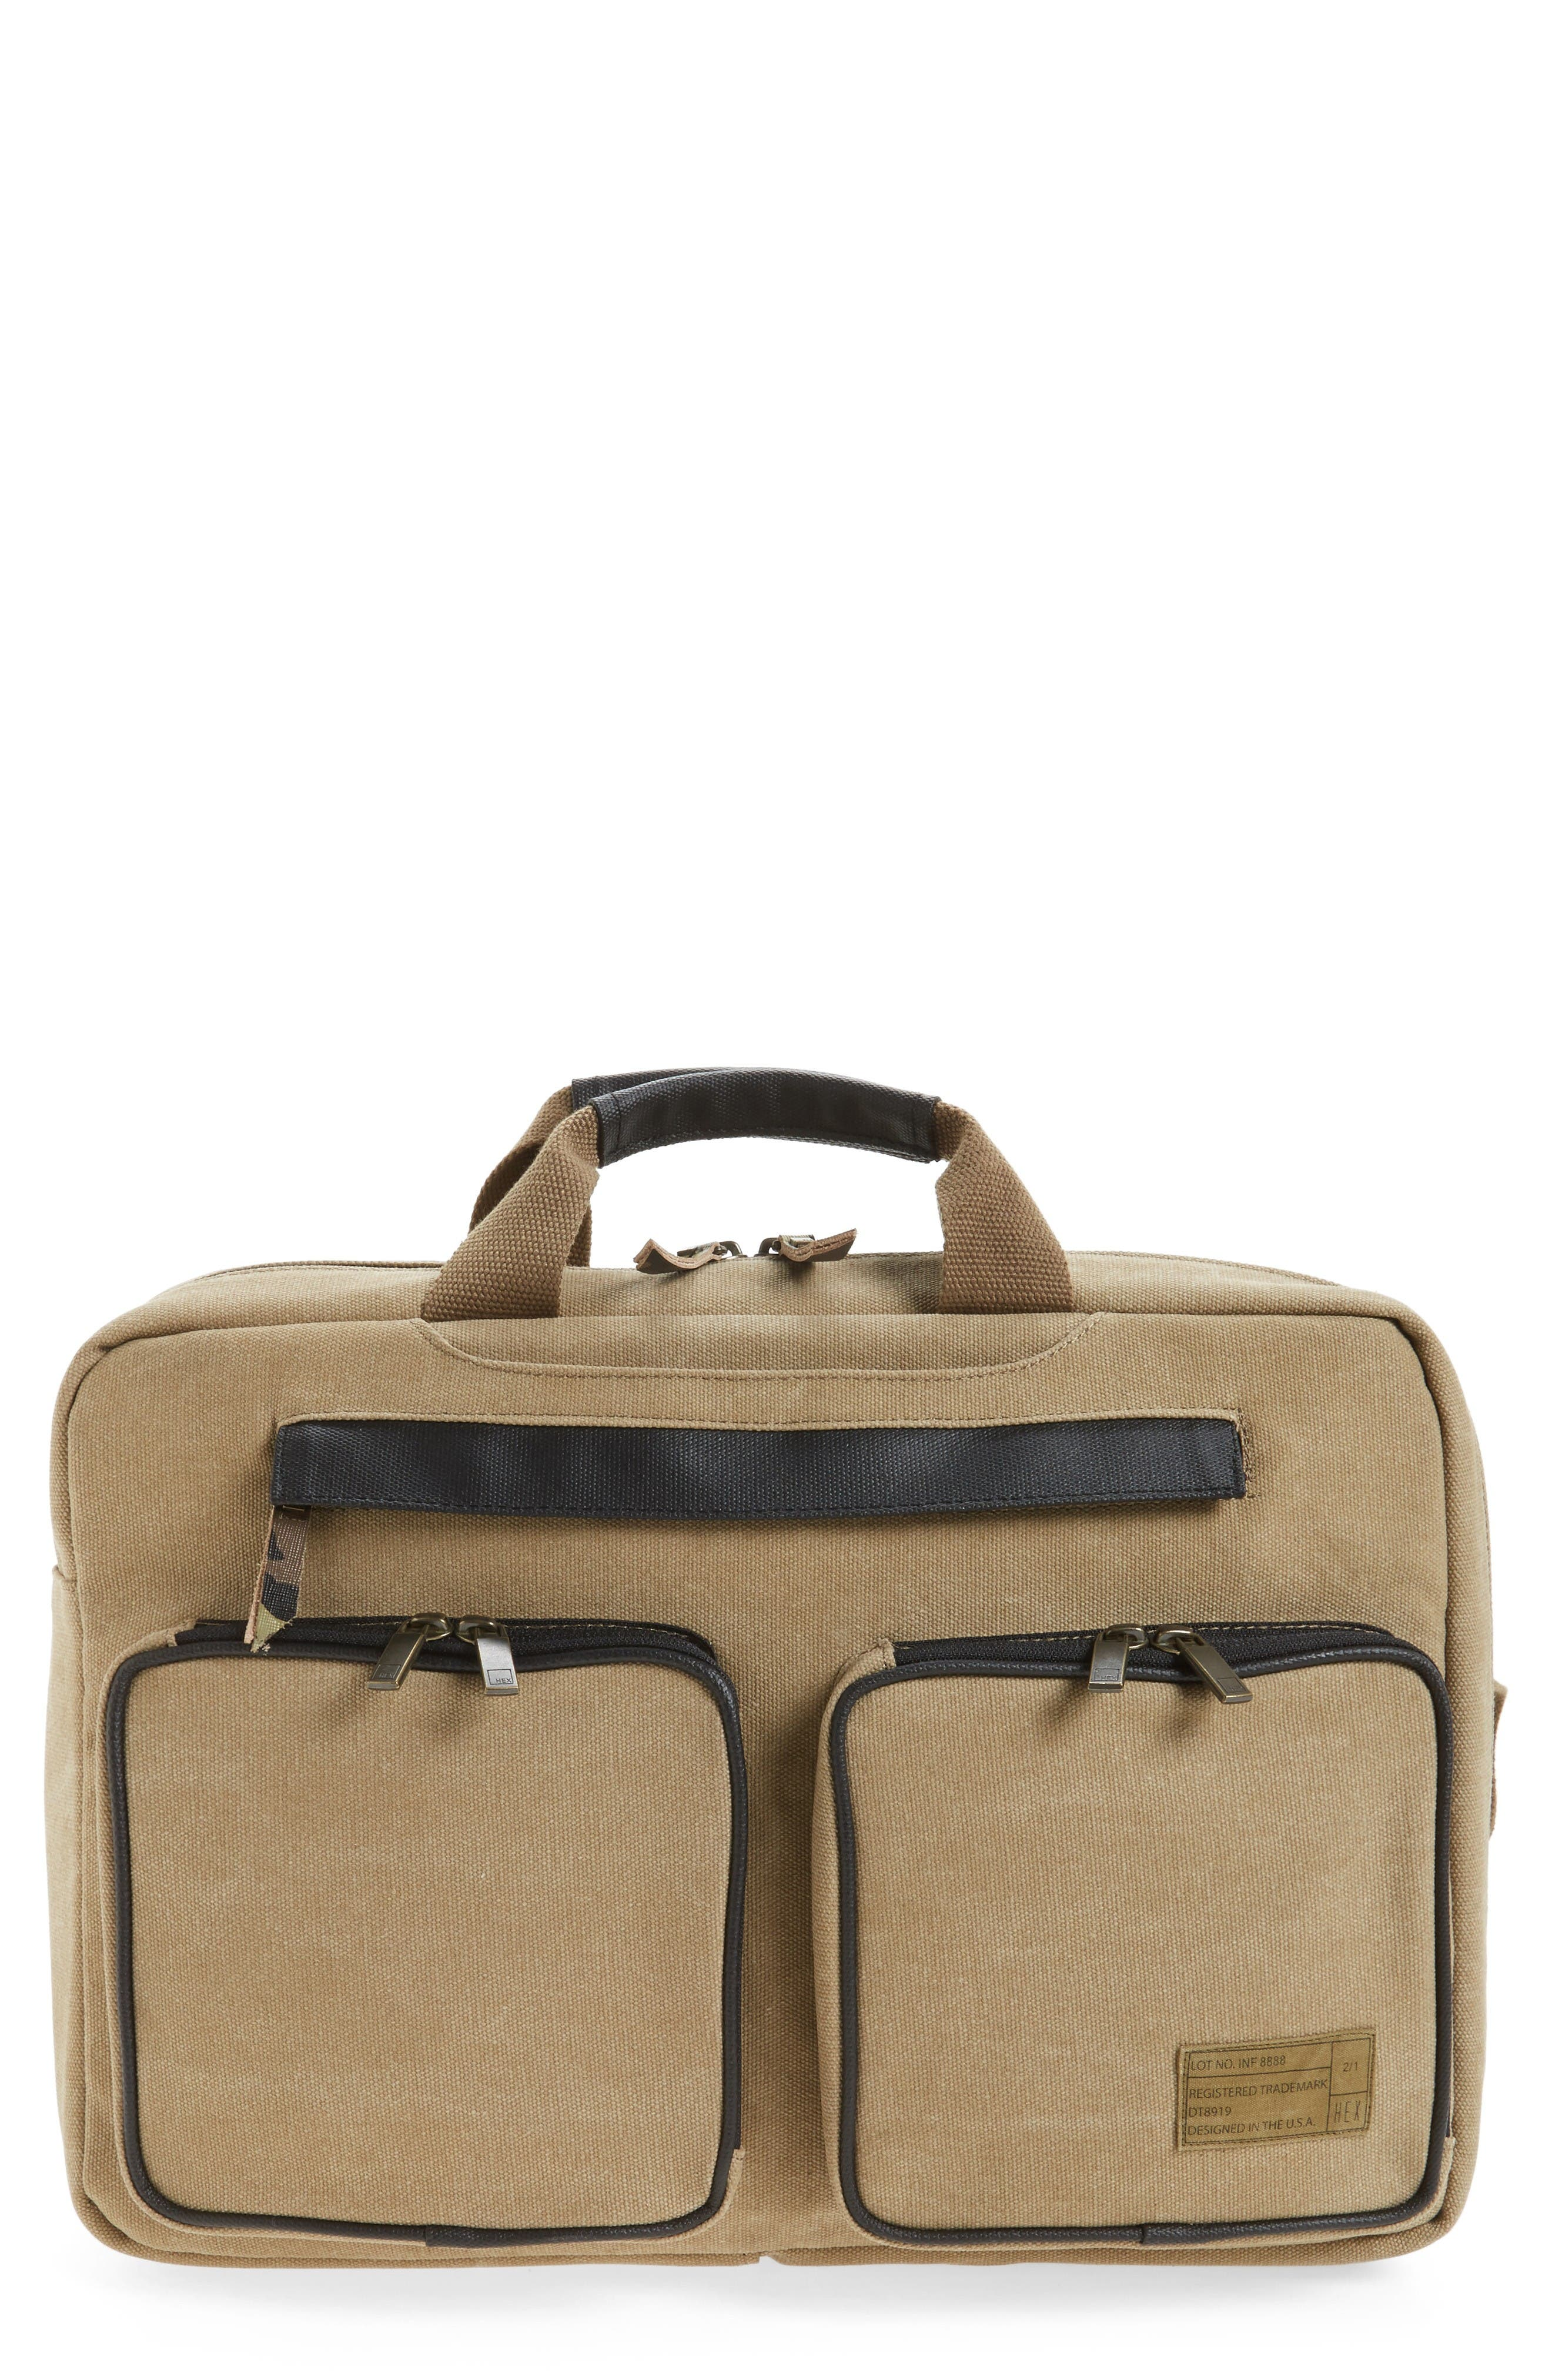 Radar Convertible Water Resistant Briefcase,                             Main thumbnail 1, color,                             Khaki